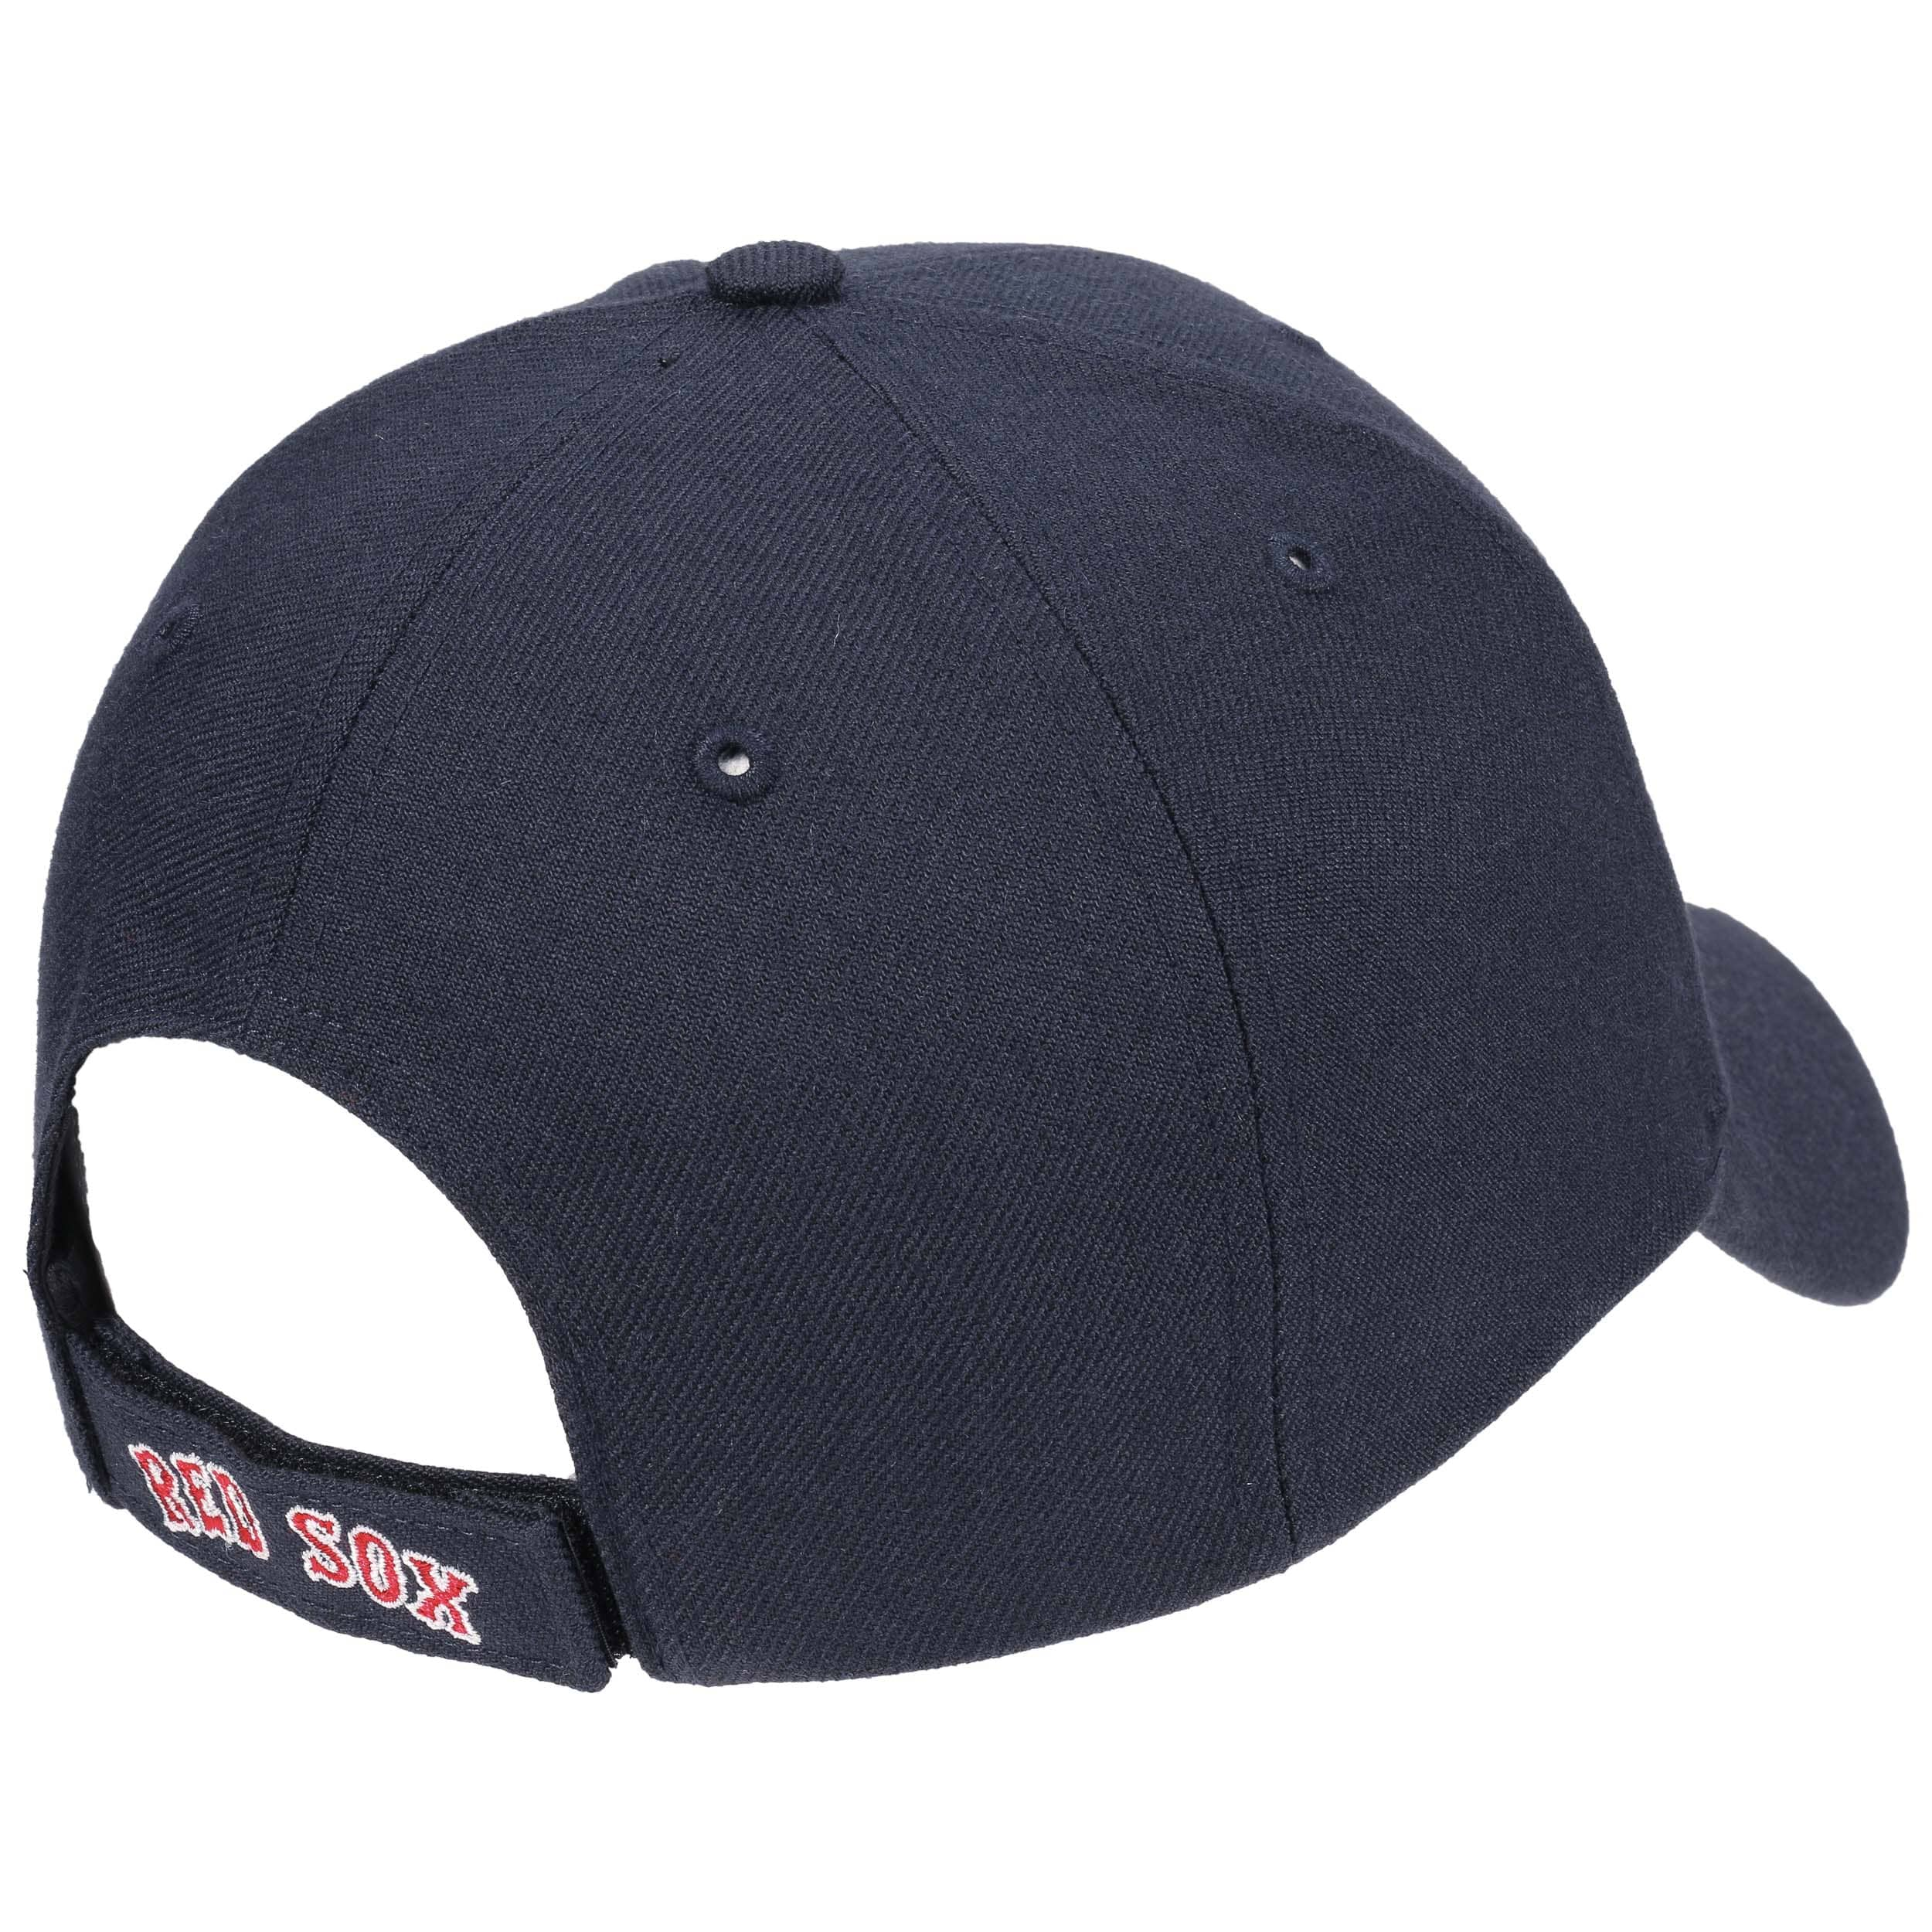 e37c011b69d95 Gorra Boston Red Sox Strapback by 47 Brand - Gorras - sombreroshop.es